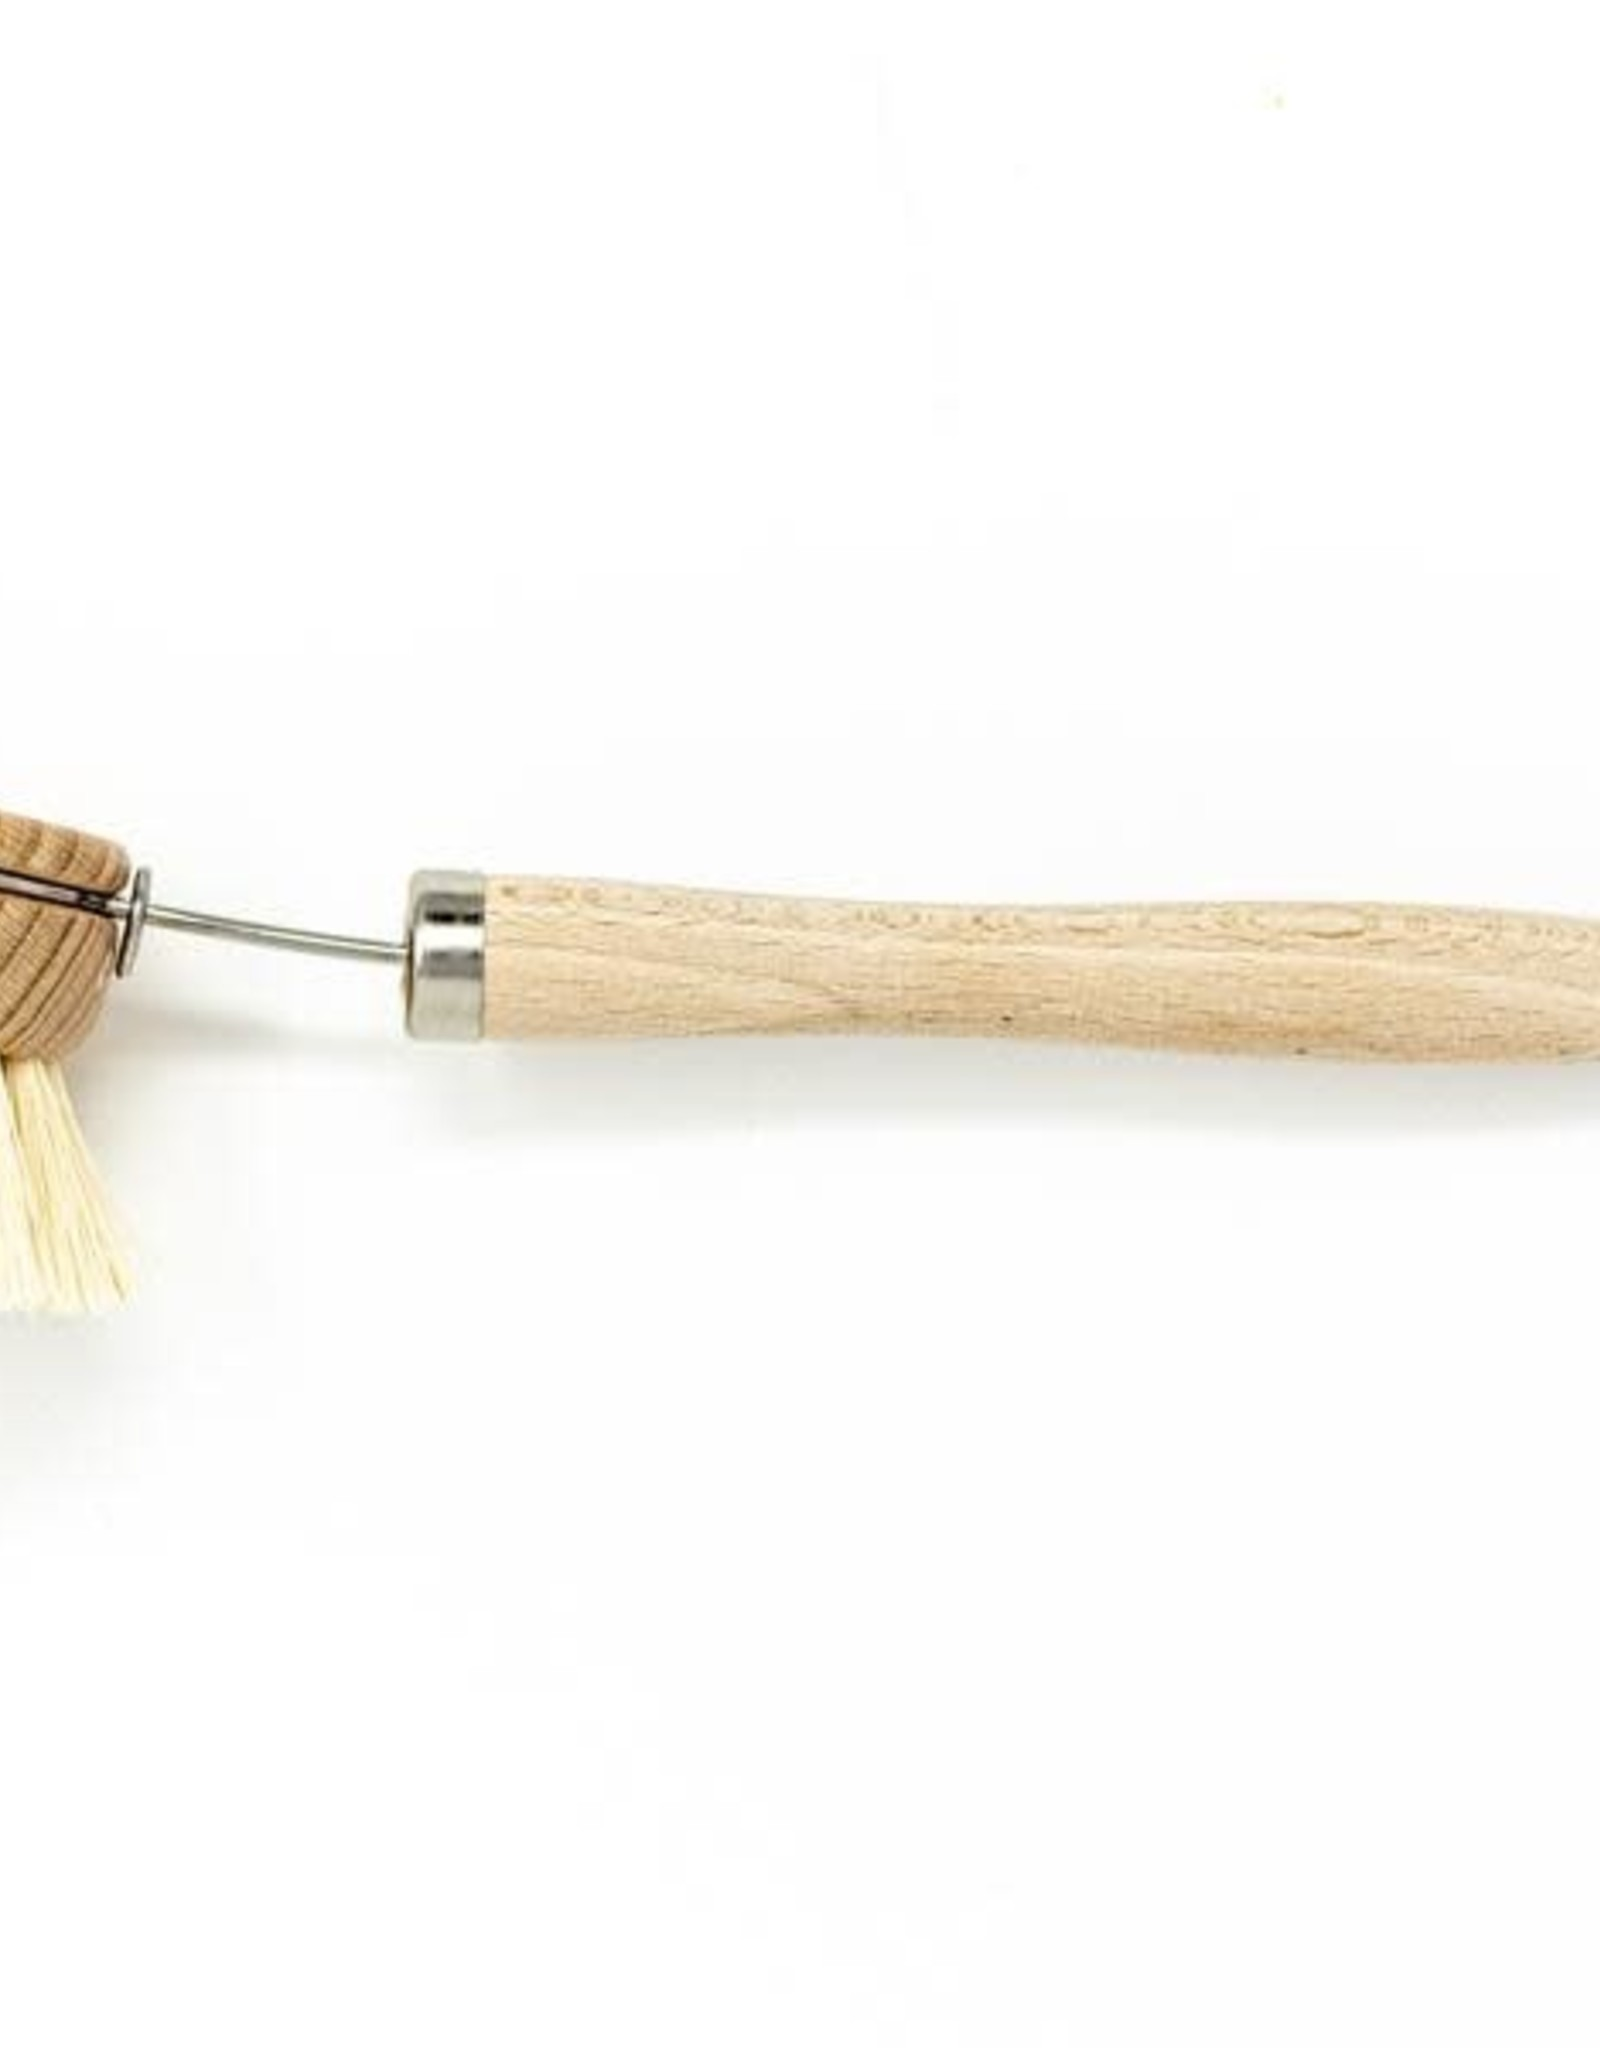 Long Handle Dish Brush